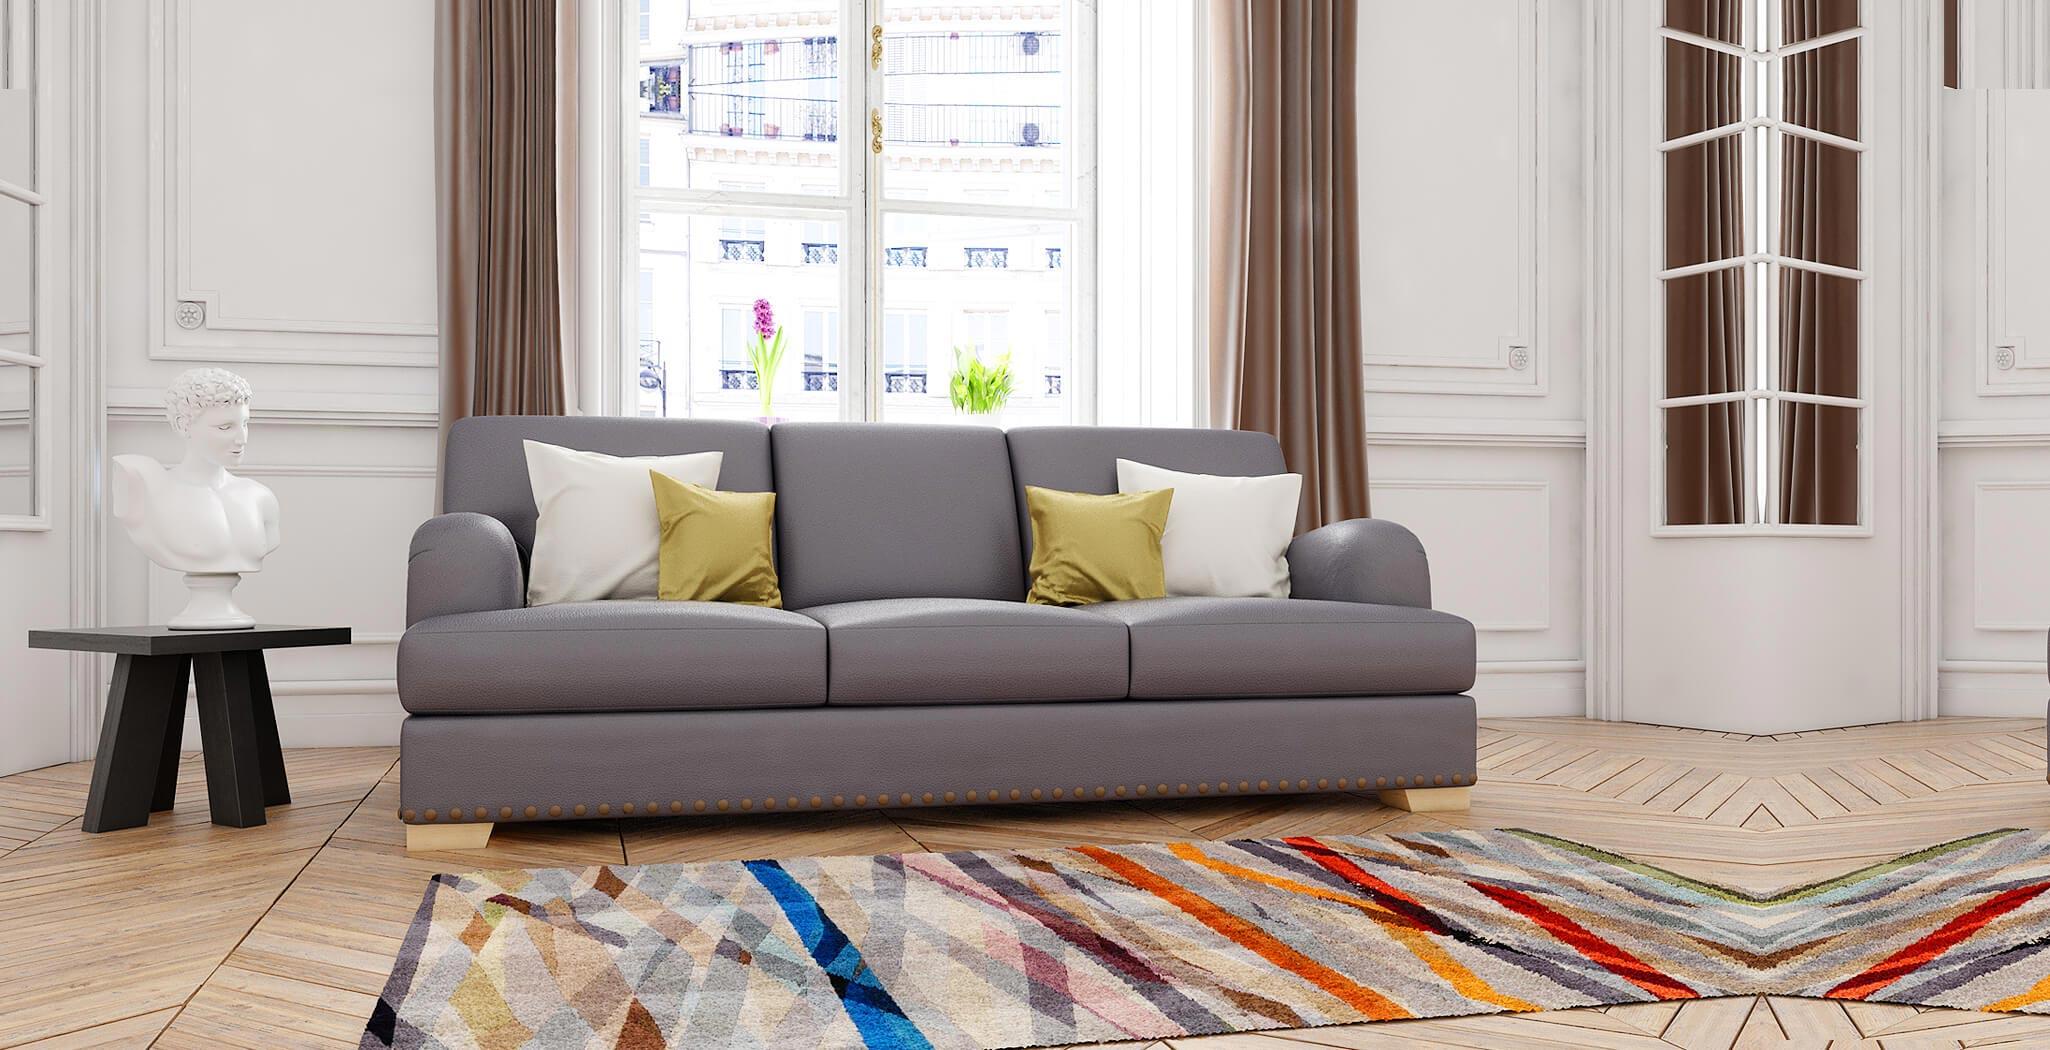 brighton sofa furniture gallery 3